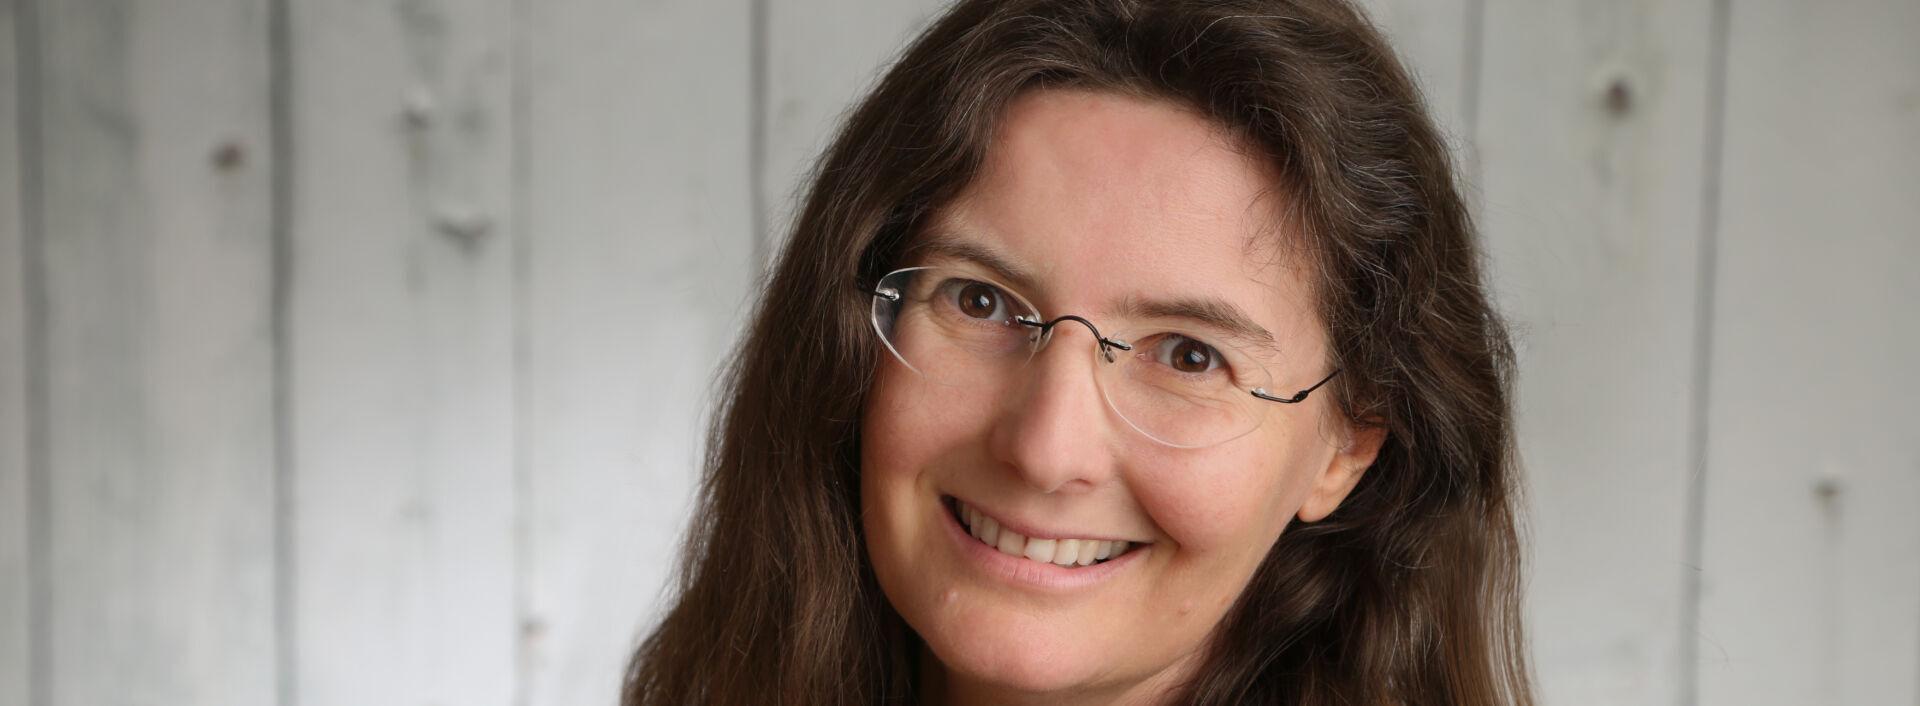 Silvia Straub, Psychotherapie